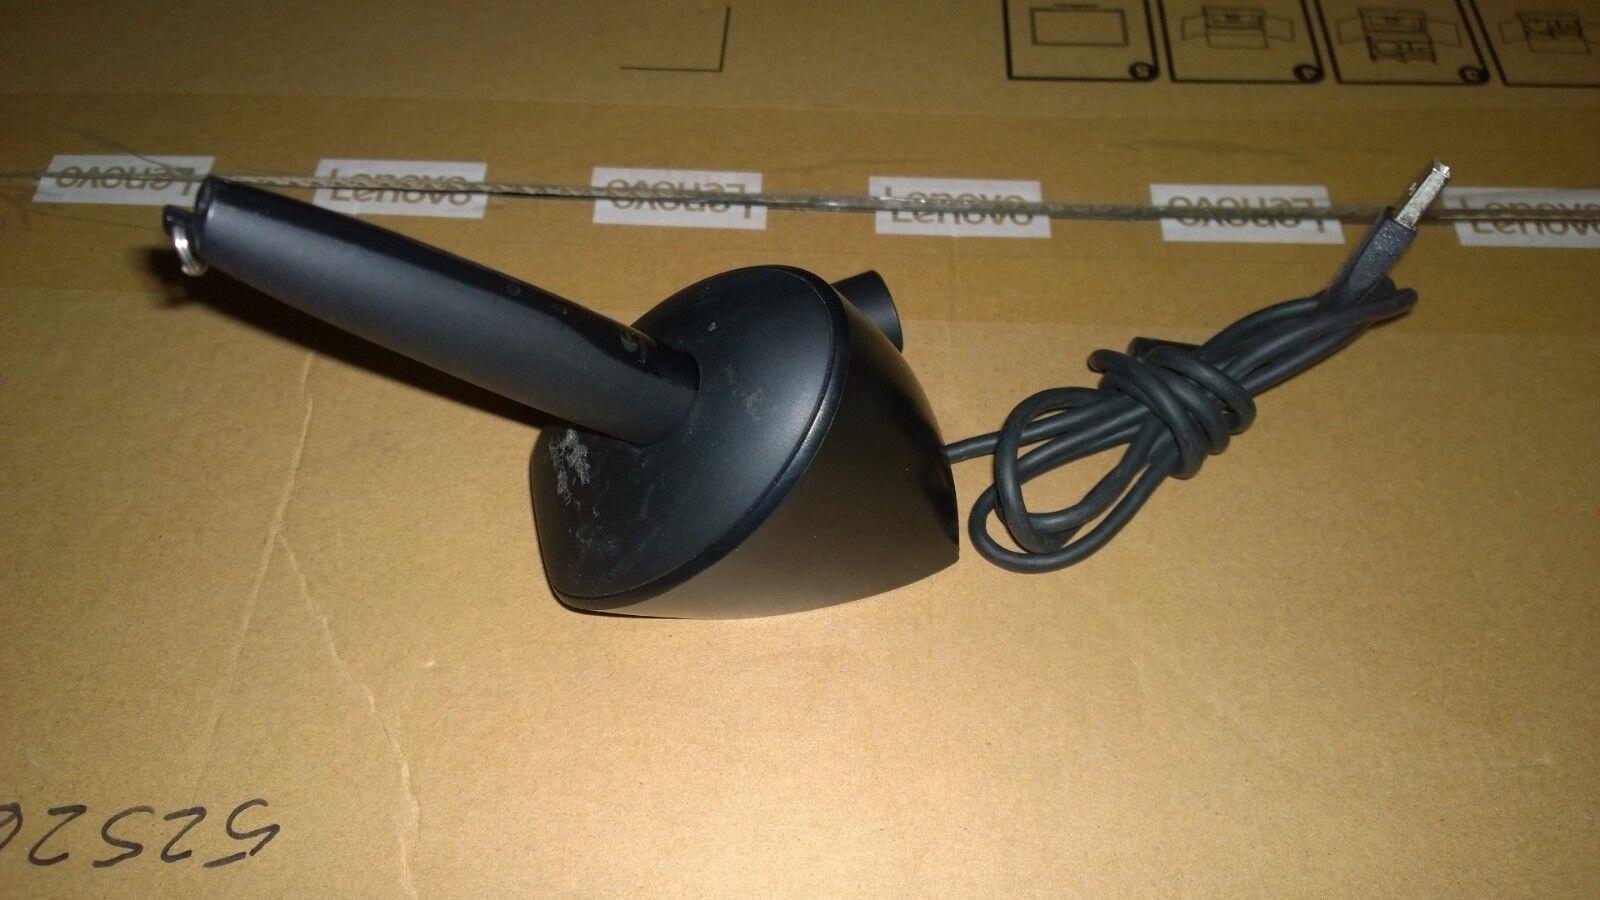 Logitech Desktop Docking Cradle For Logitech Io2 Pen Graphics Tablets/boards & Pens 866108-0000